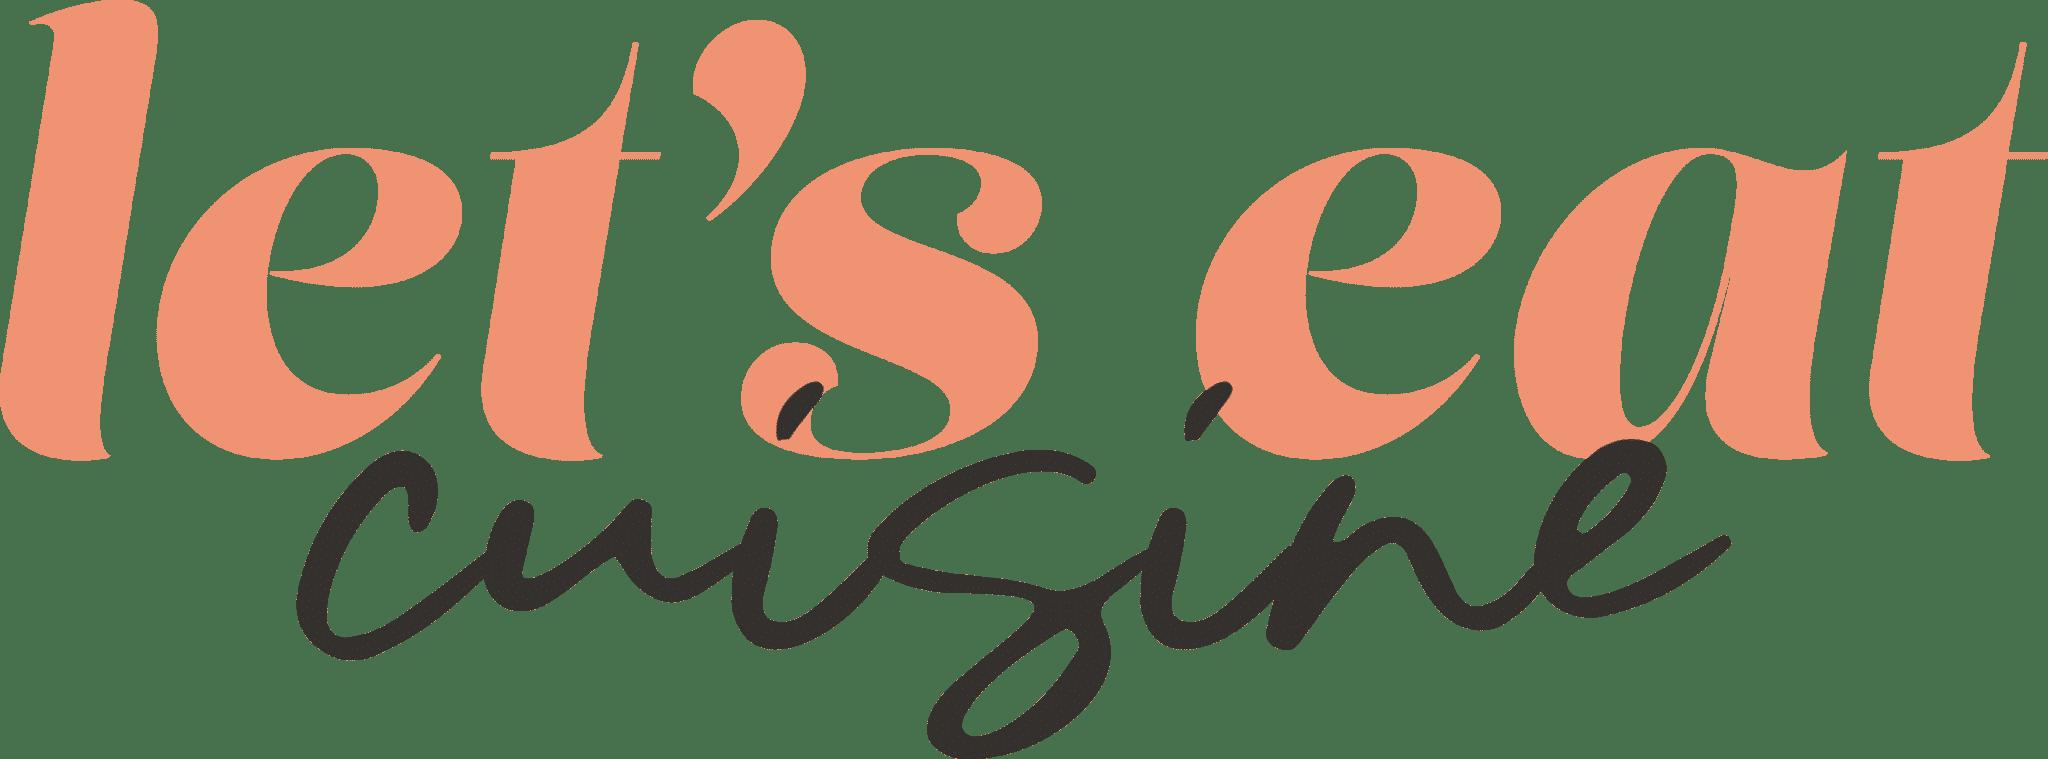 letseatcuisine logo